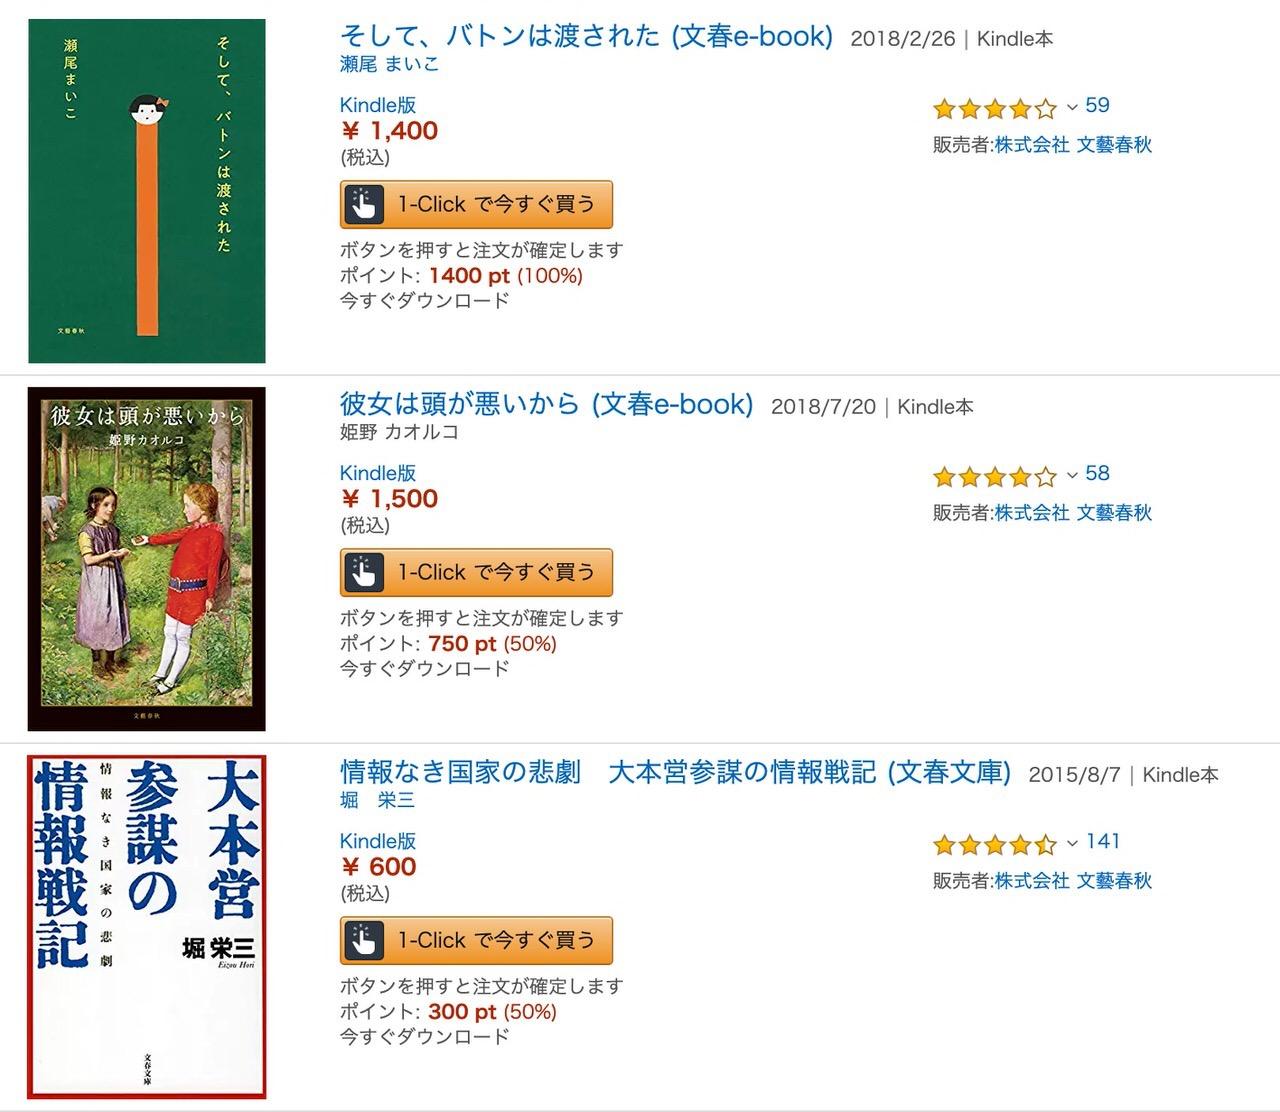 【Kindleセール】4,000冊以上が対象!50%ポイント還元「文春祭り」(5/9まで)